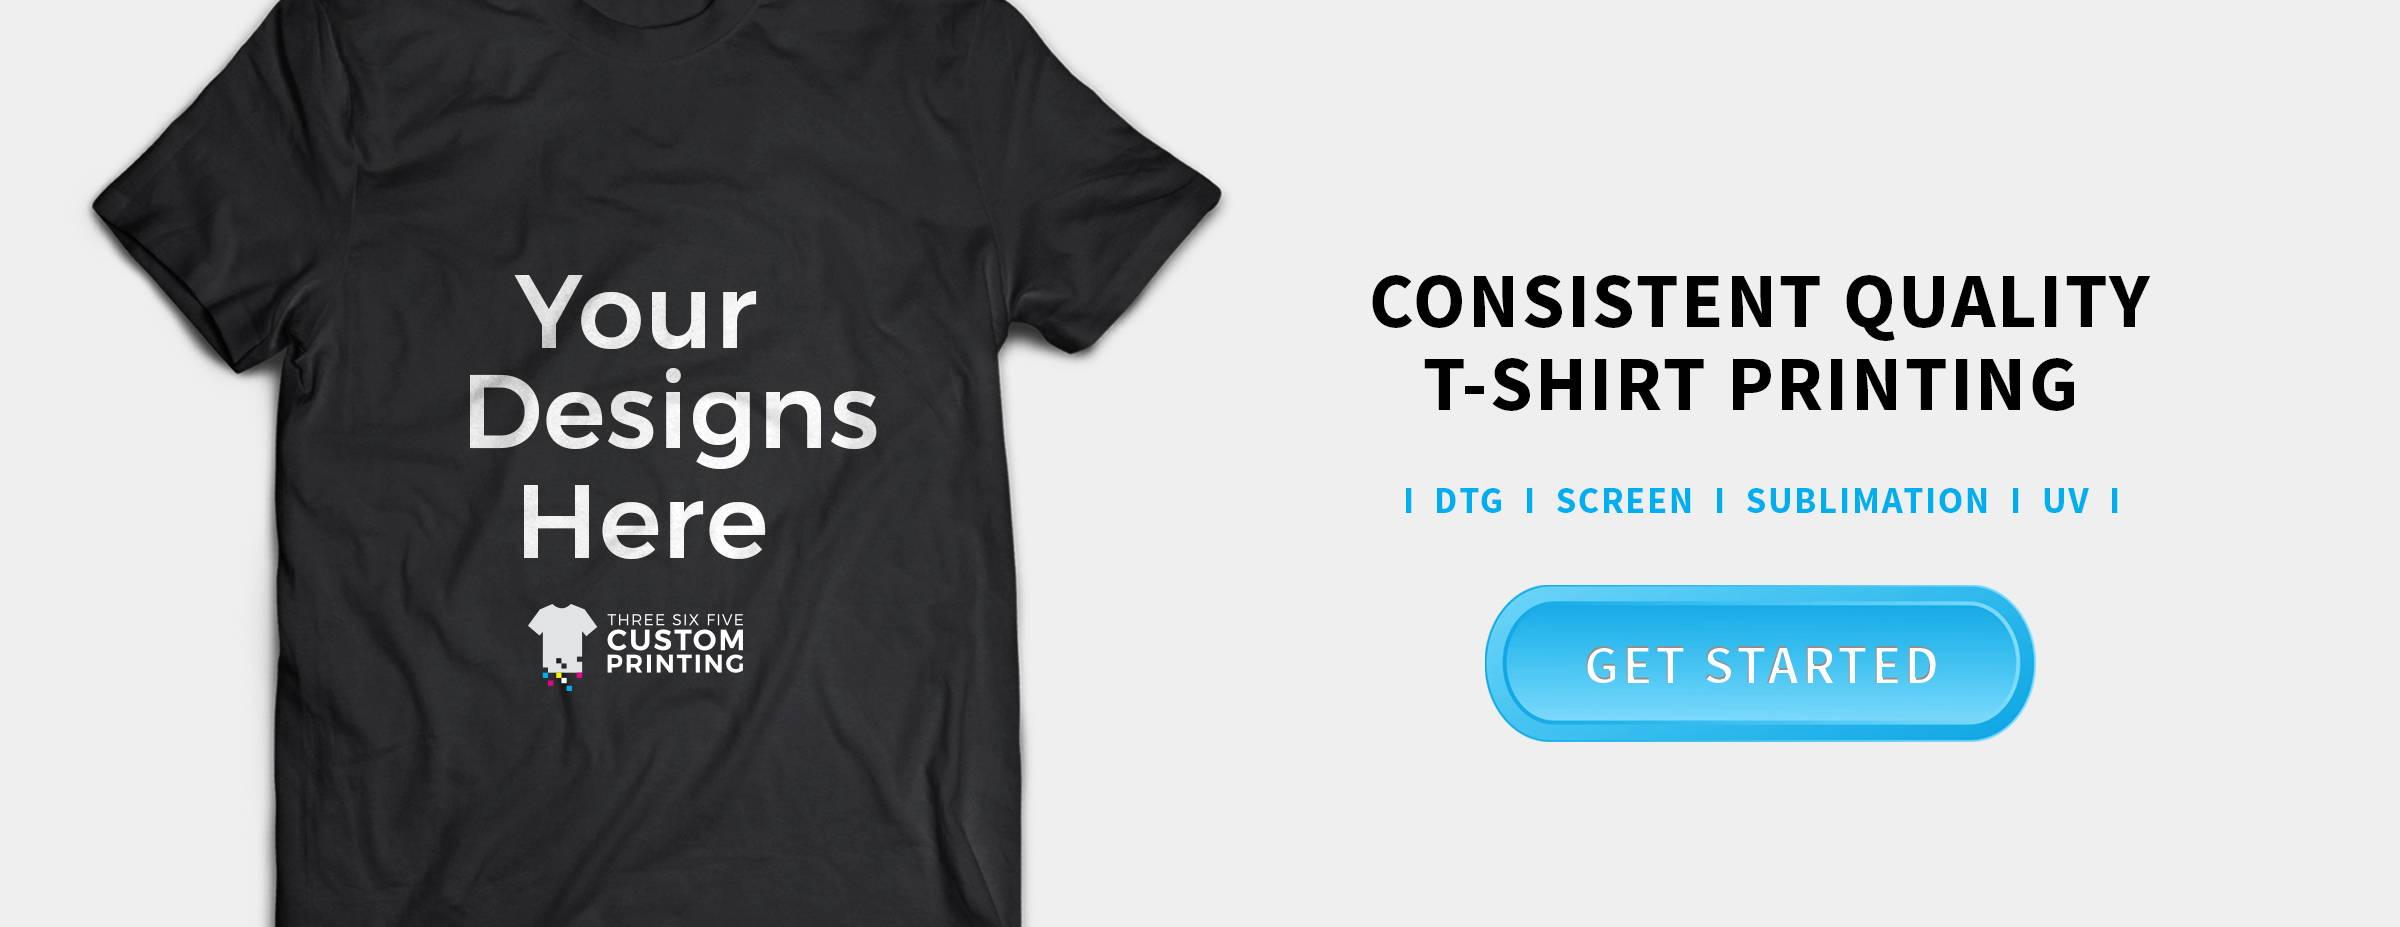 Custom printing on shirts south park t shirts for Custom dress shirts orange county